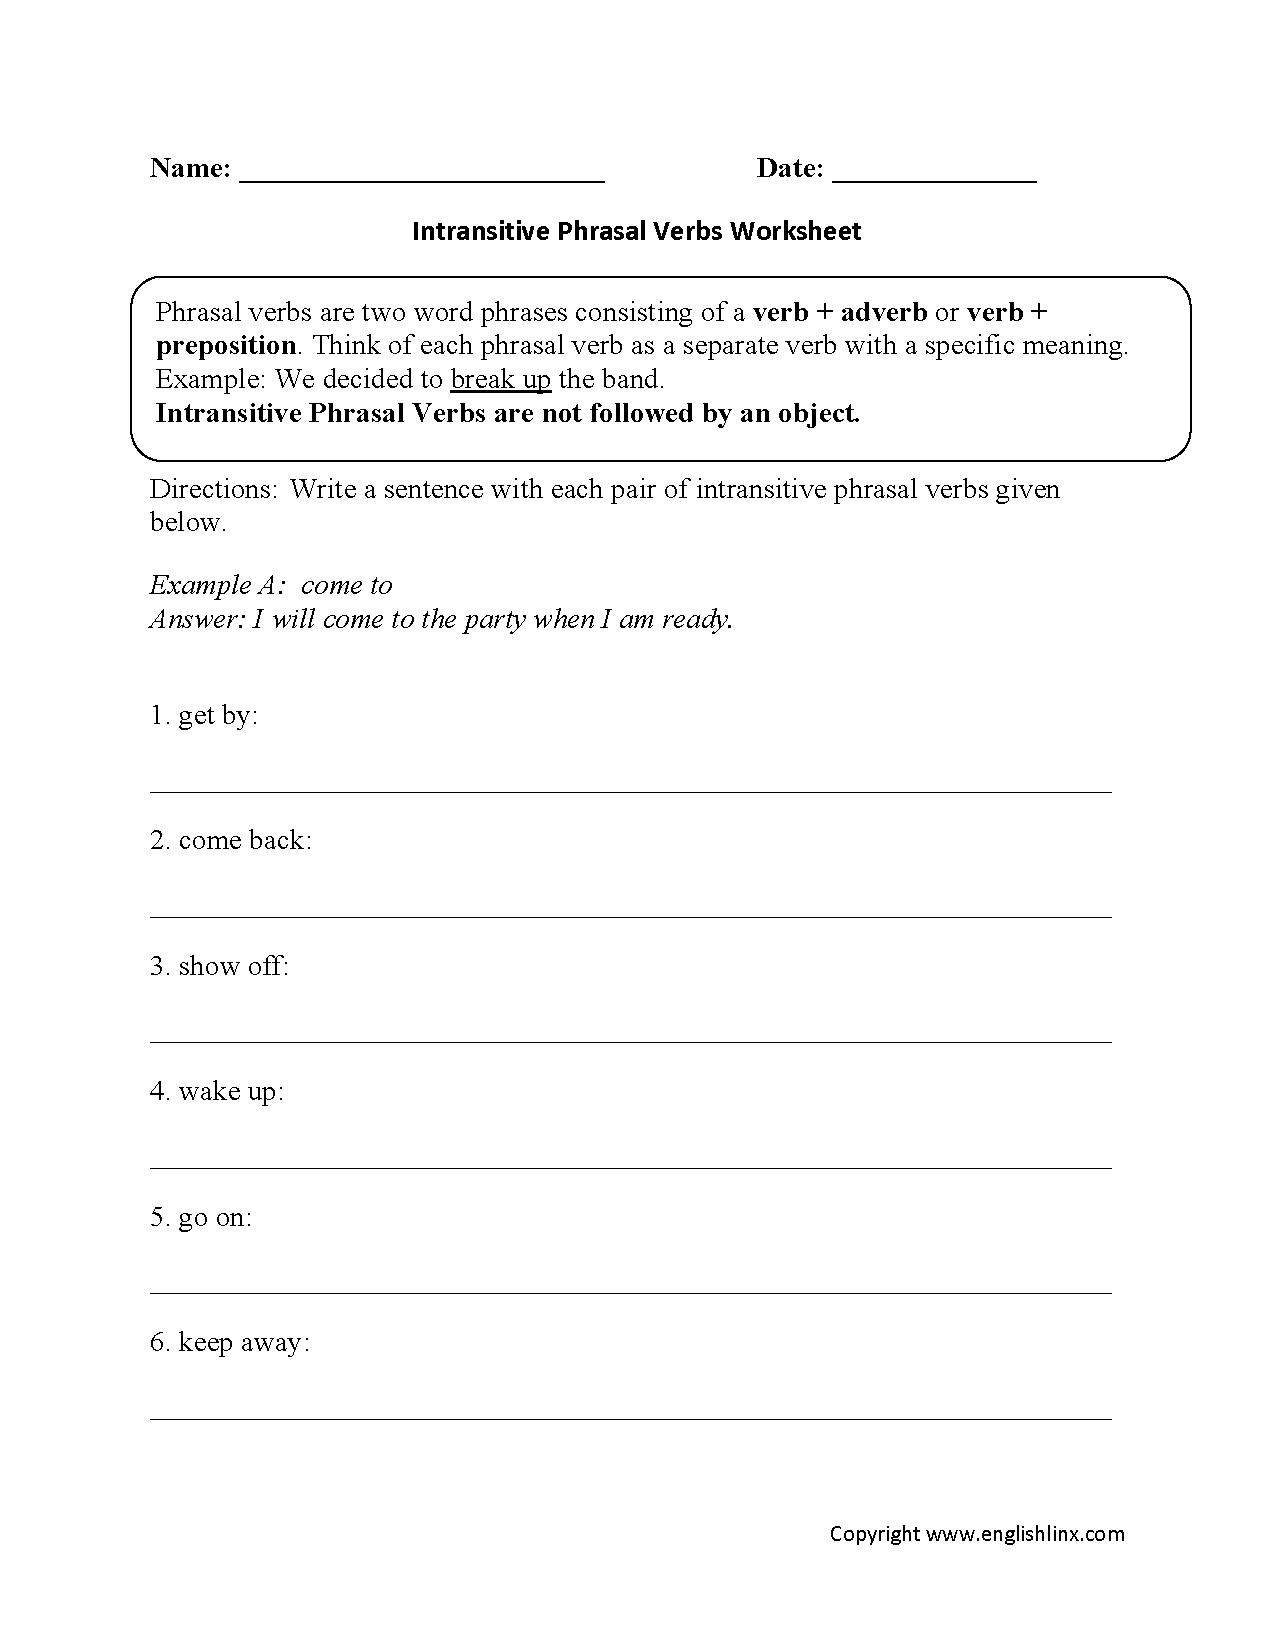 Worksheet On Doing Verbs